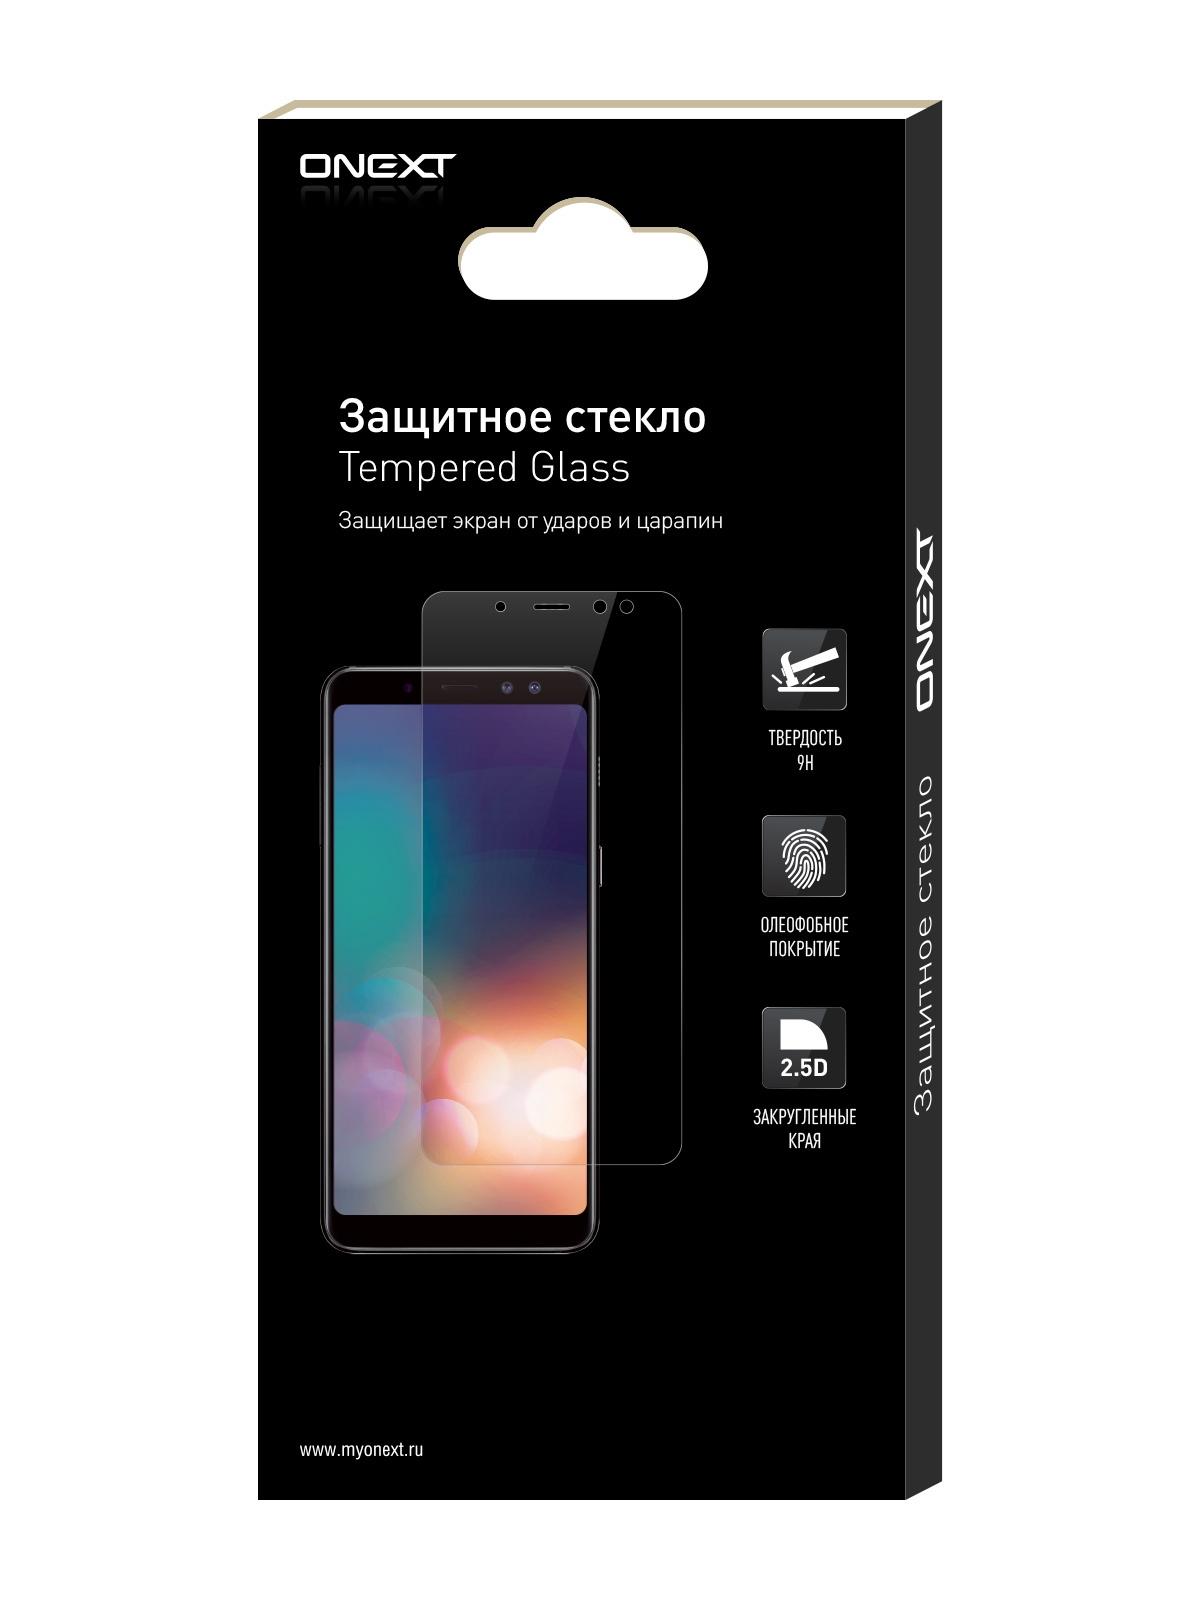 Защитное стекло ONEXT Sony Xperia XA1 Ultra